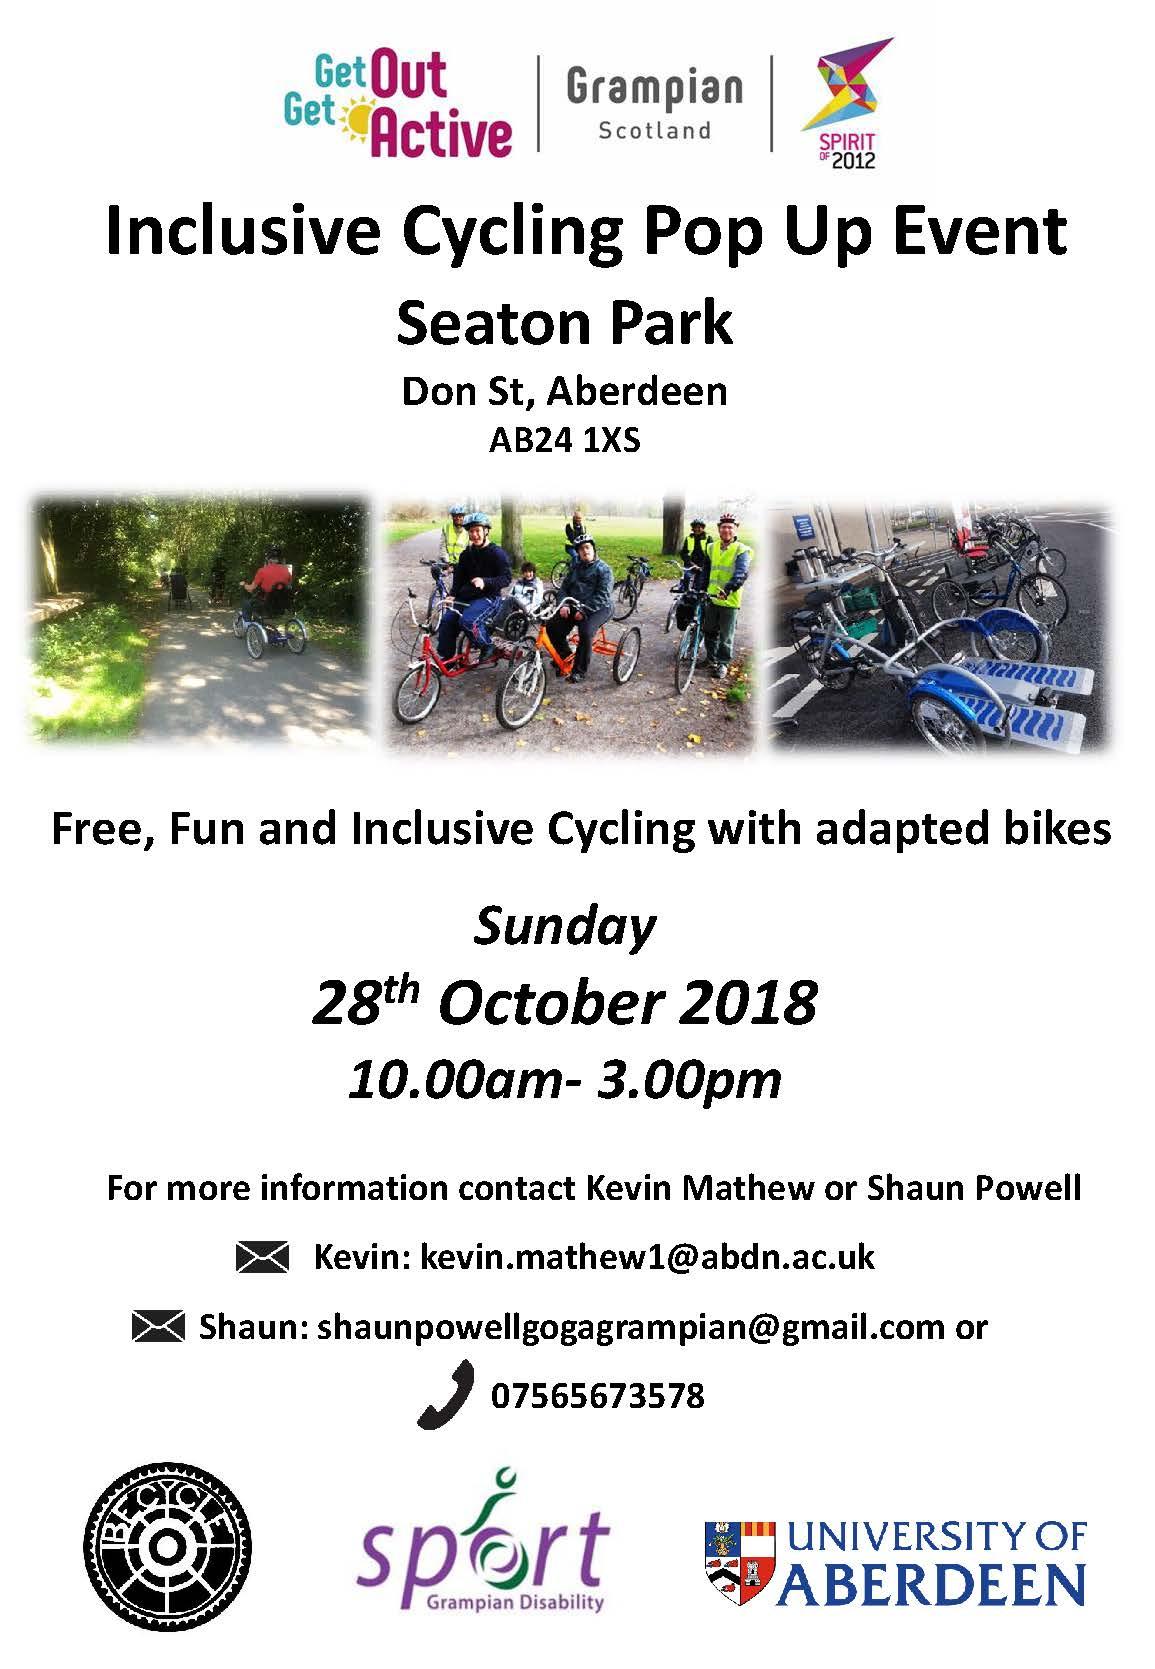 Inclusive Cycling Pop Up event – Aberdeen